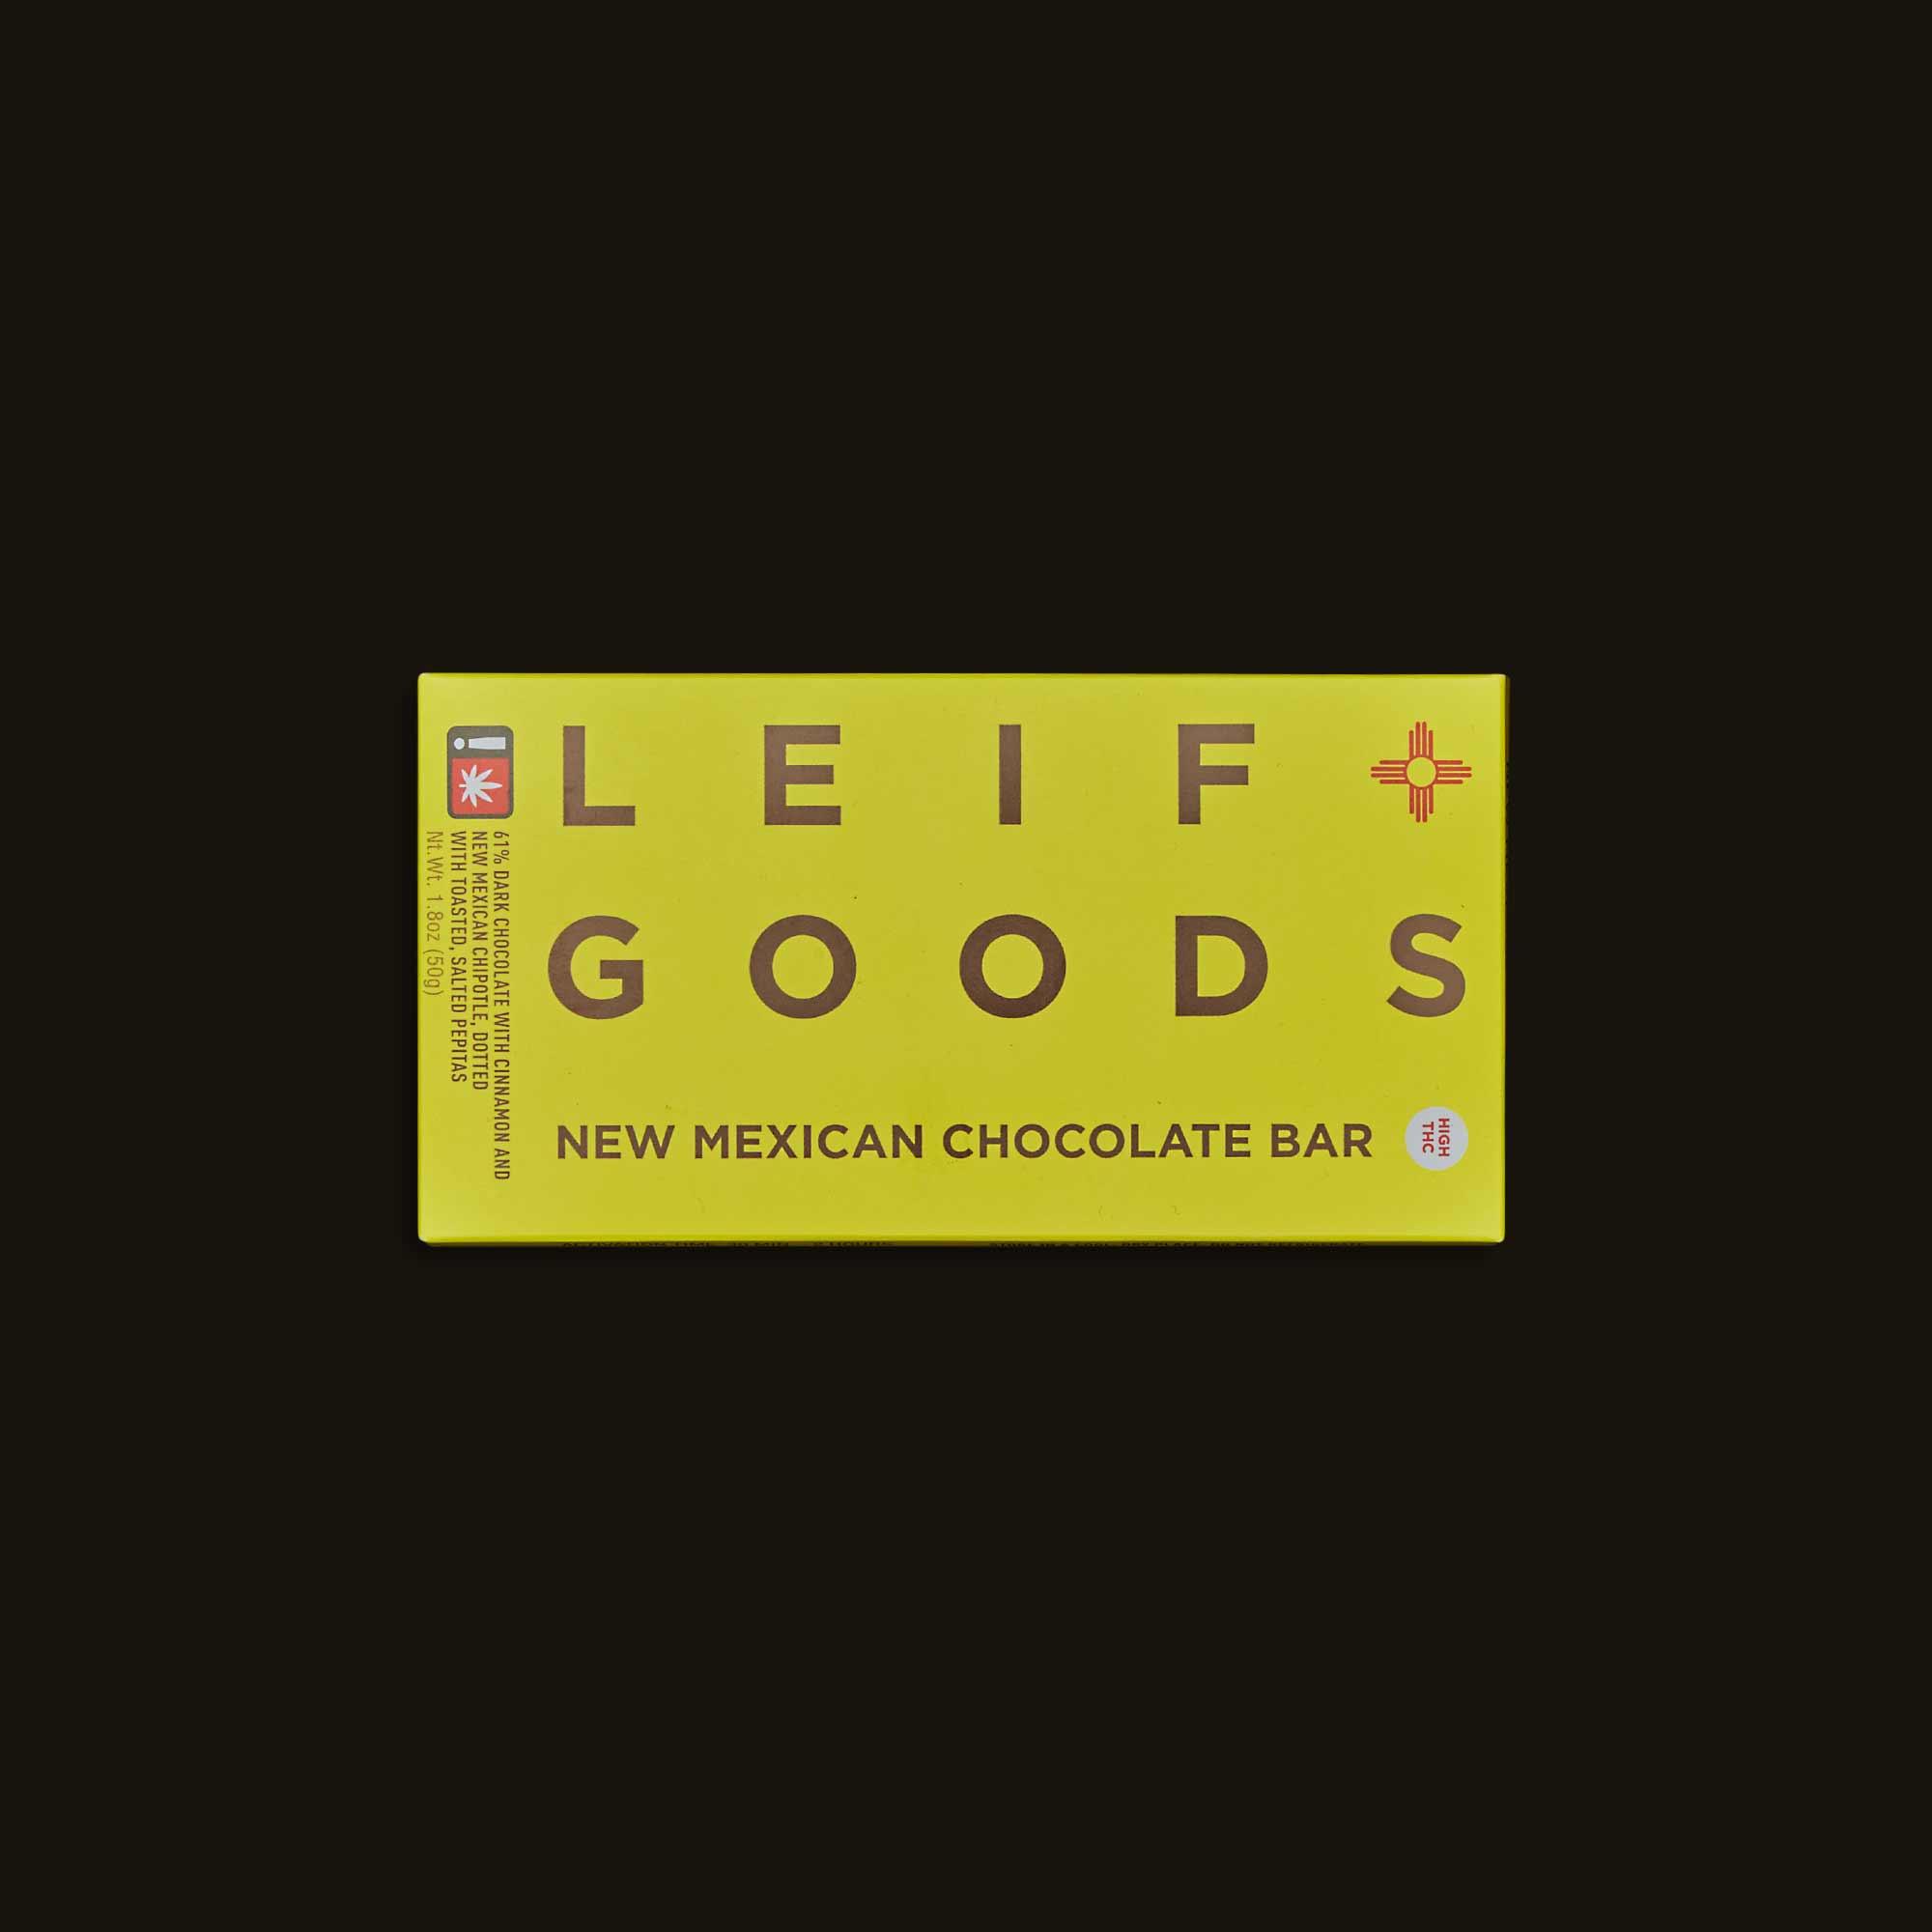 Leif Goods New Mexican Chocolate Bar